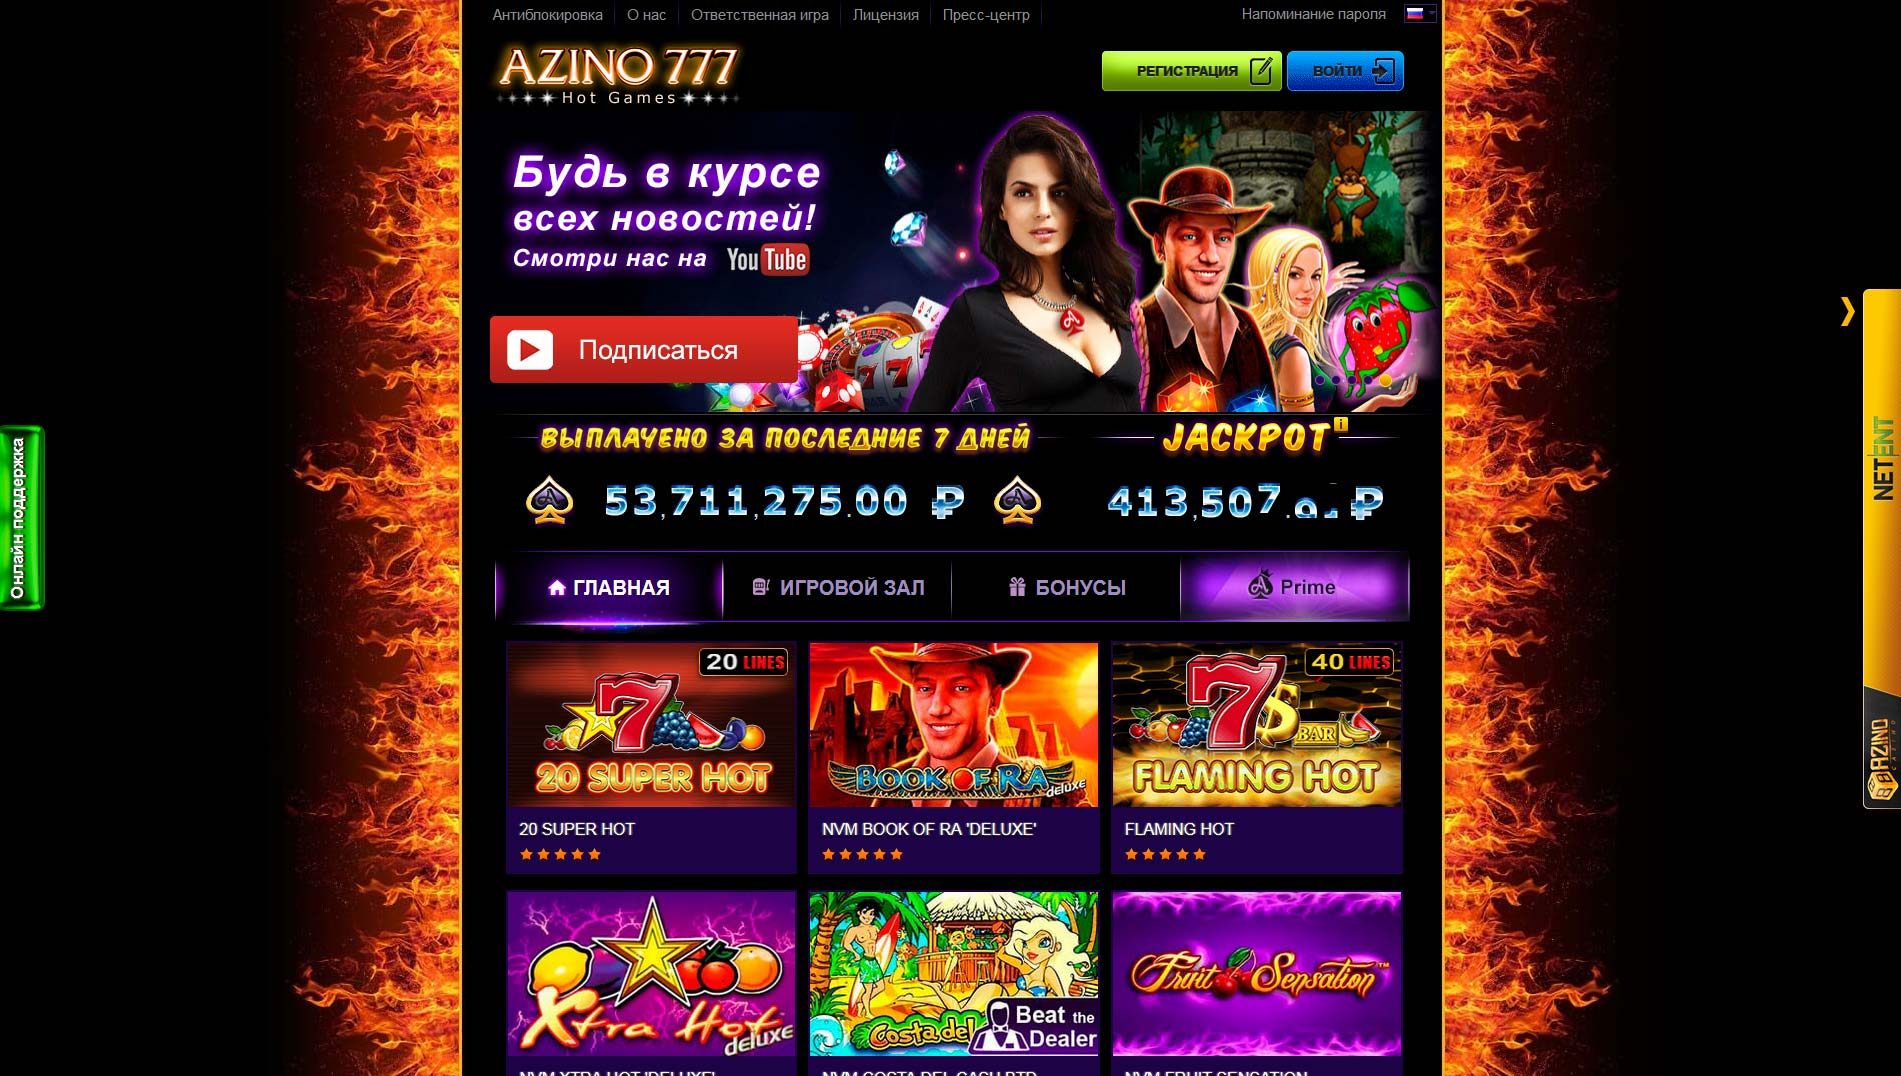 азино777 официальный сайт kazino kazino net